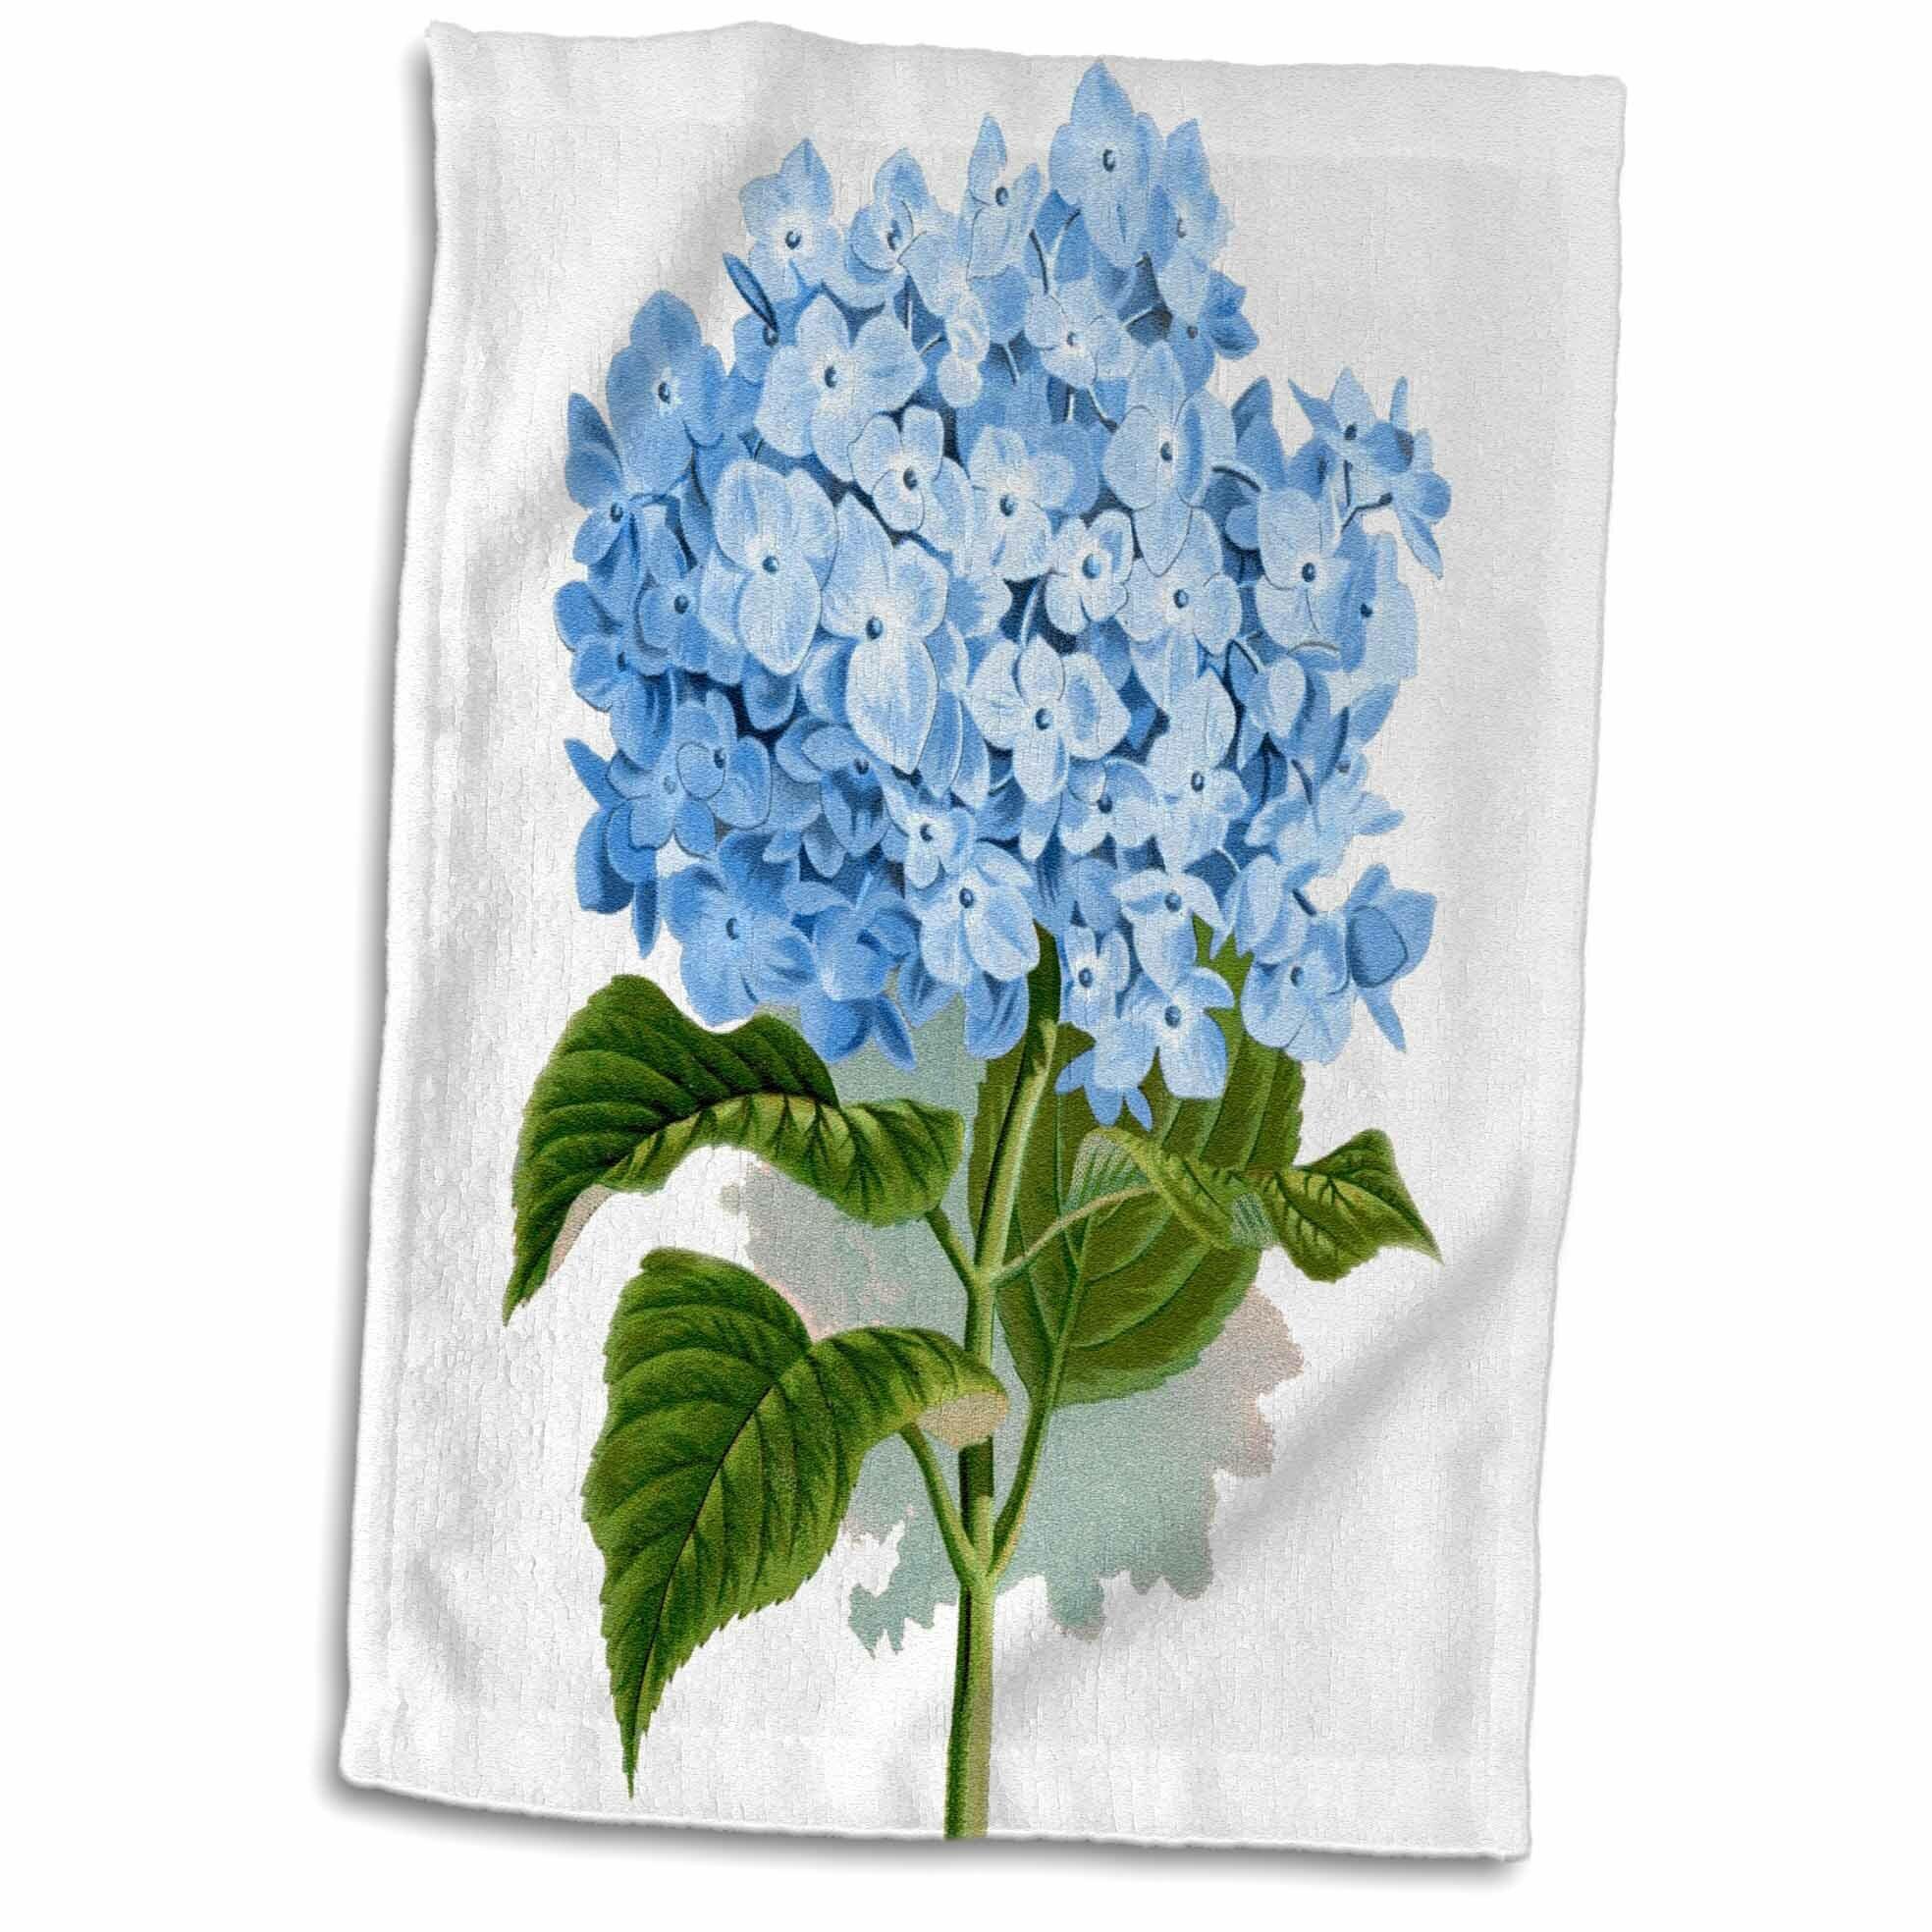 Symple Stuff Meriwether Hydrangea Flowers Art Floral Drawing Summery Spring Antique Image Hand Towel Wayfair